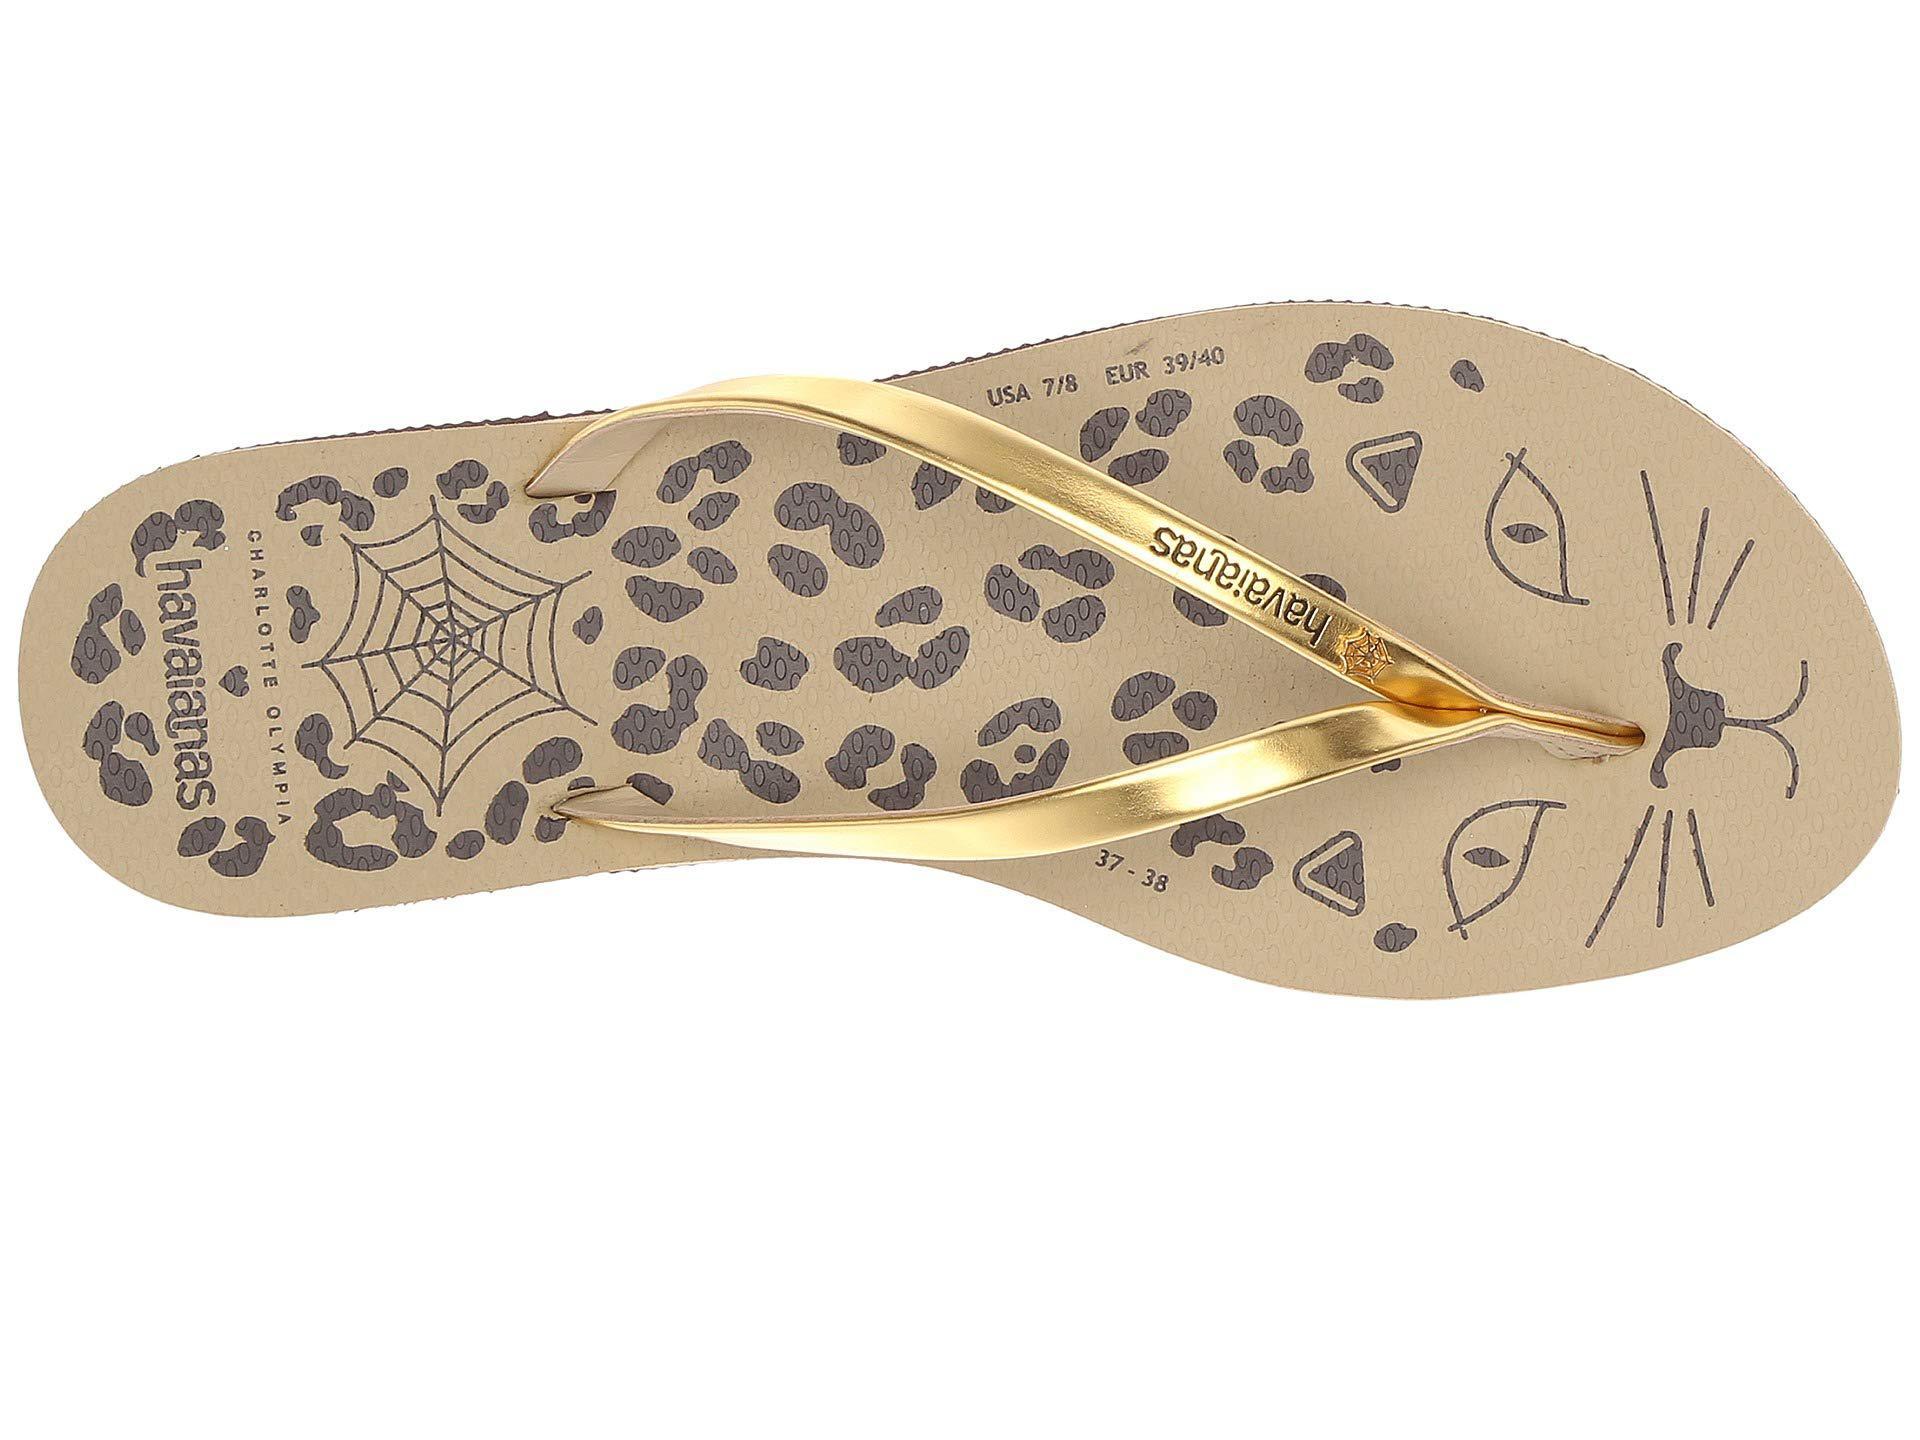 b9041ba43b9e Charlotte Olympia - Cat Flip-flop (open Brown) Women s Sandals - Lyst. View  fullscreen